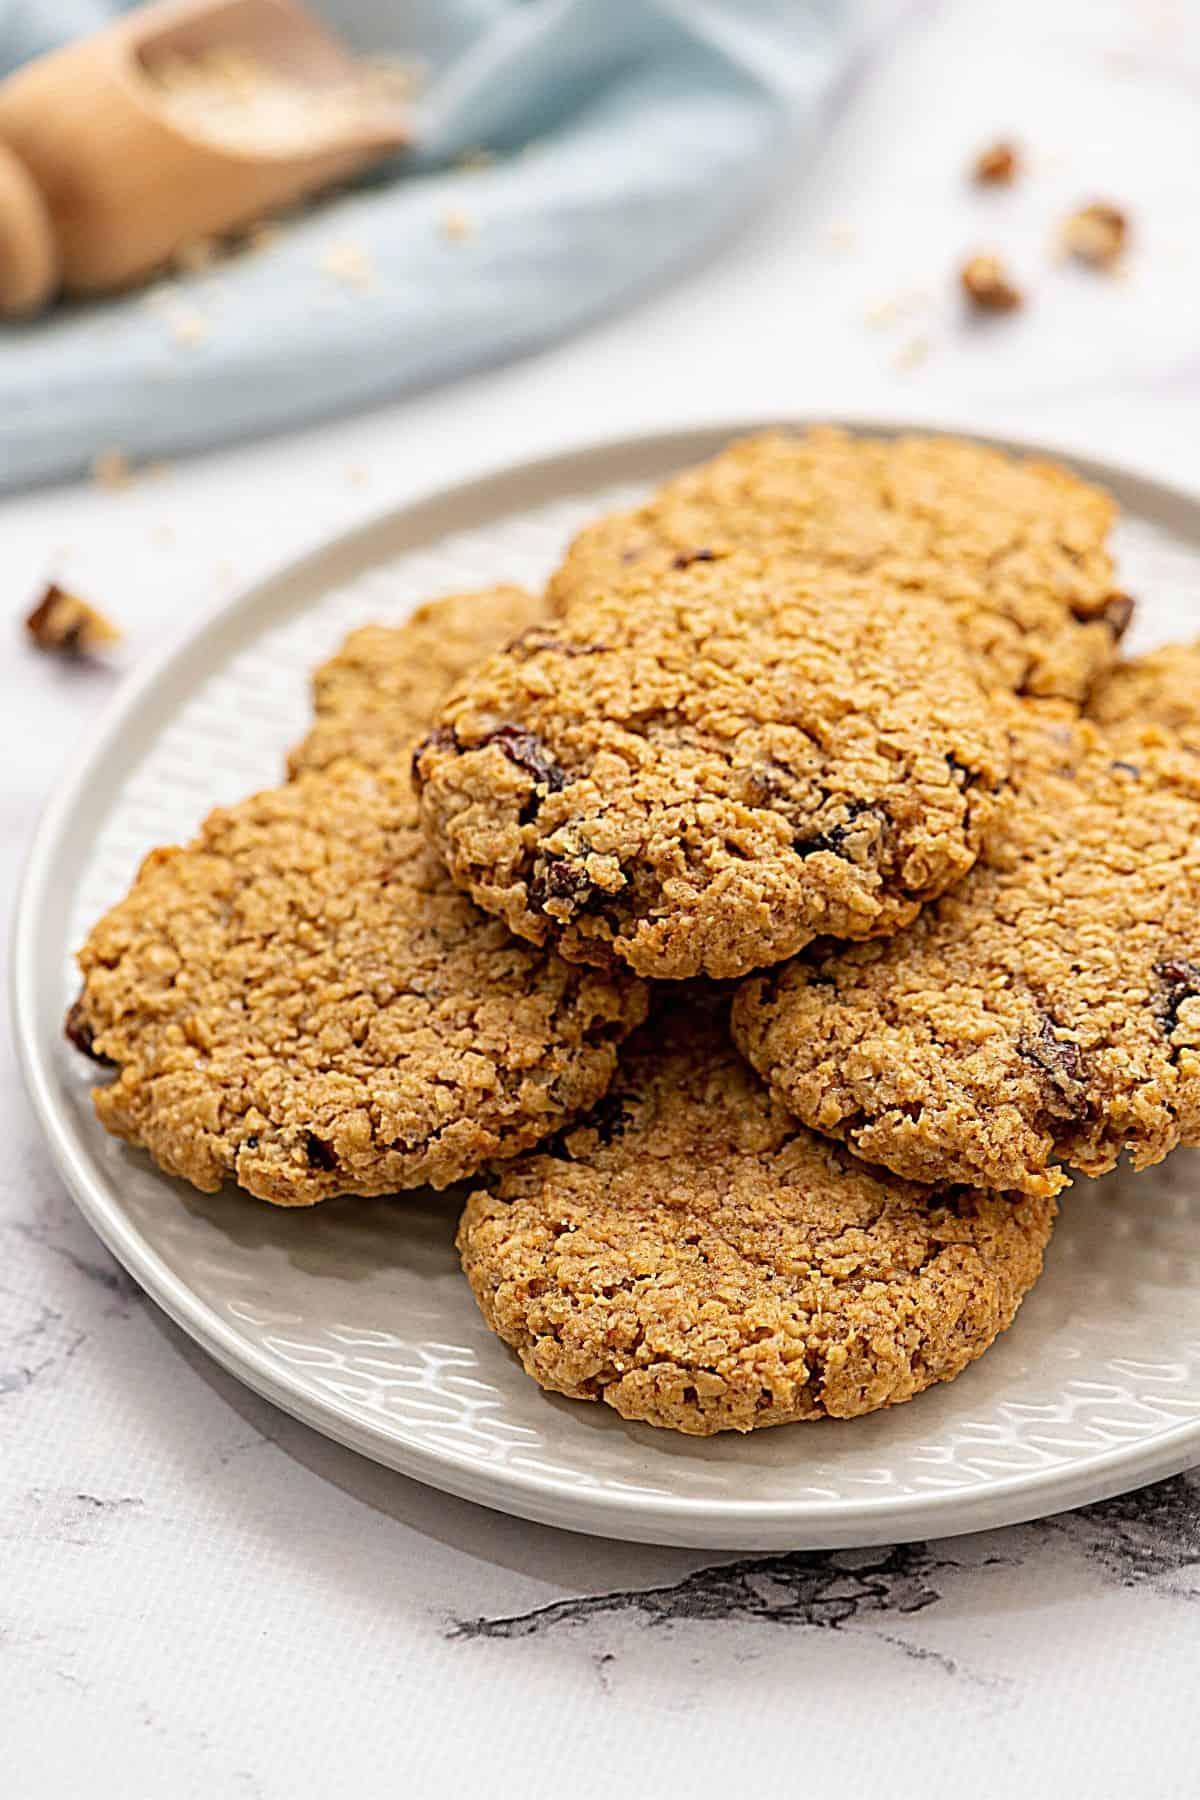 Plate of baked oatmeal raisin cookies.